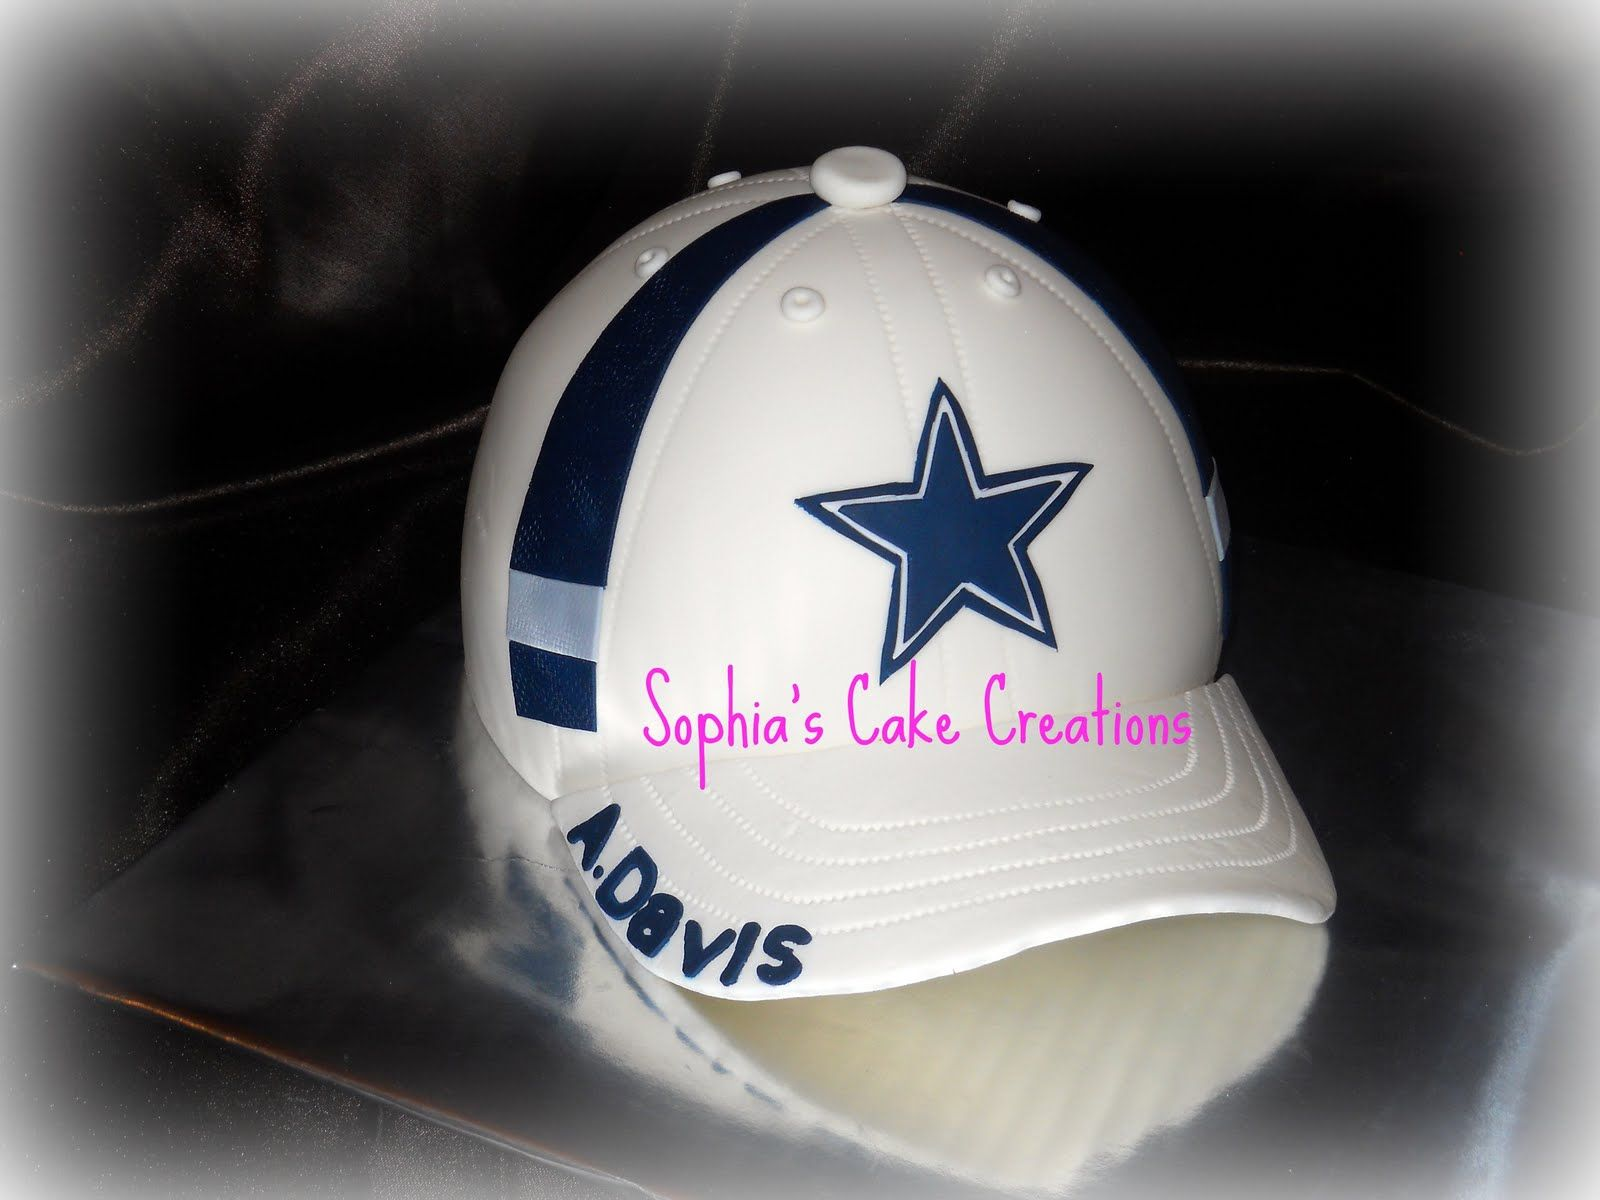 e5b7a891d2f Sophia s Cake Creations  Dallas Cowboy Ball Cap Cake